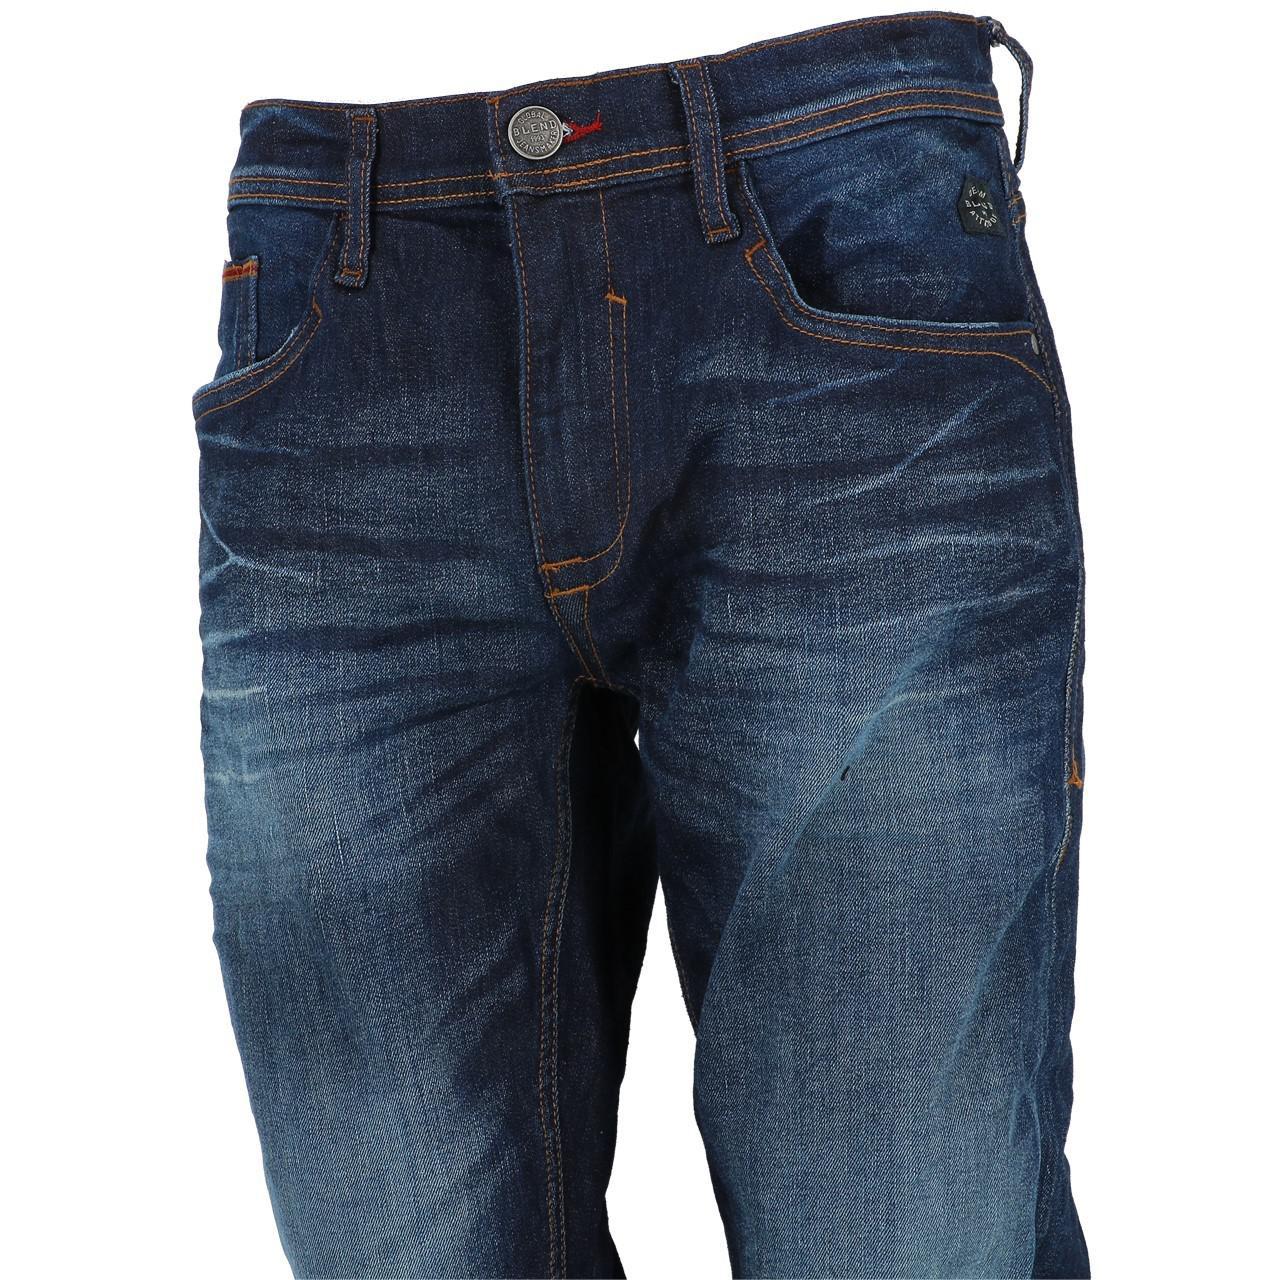 Jeans-Pants-Slim-Blend-Twister-34-Denim-Dark-Reg-Blue-25943-New thumbnail 4